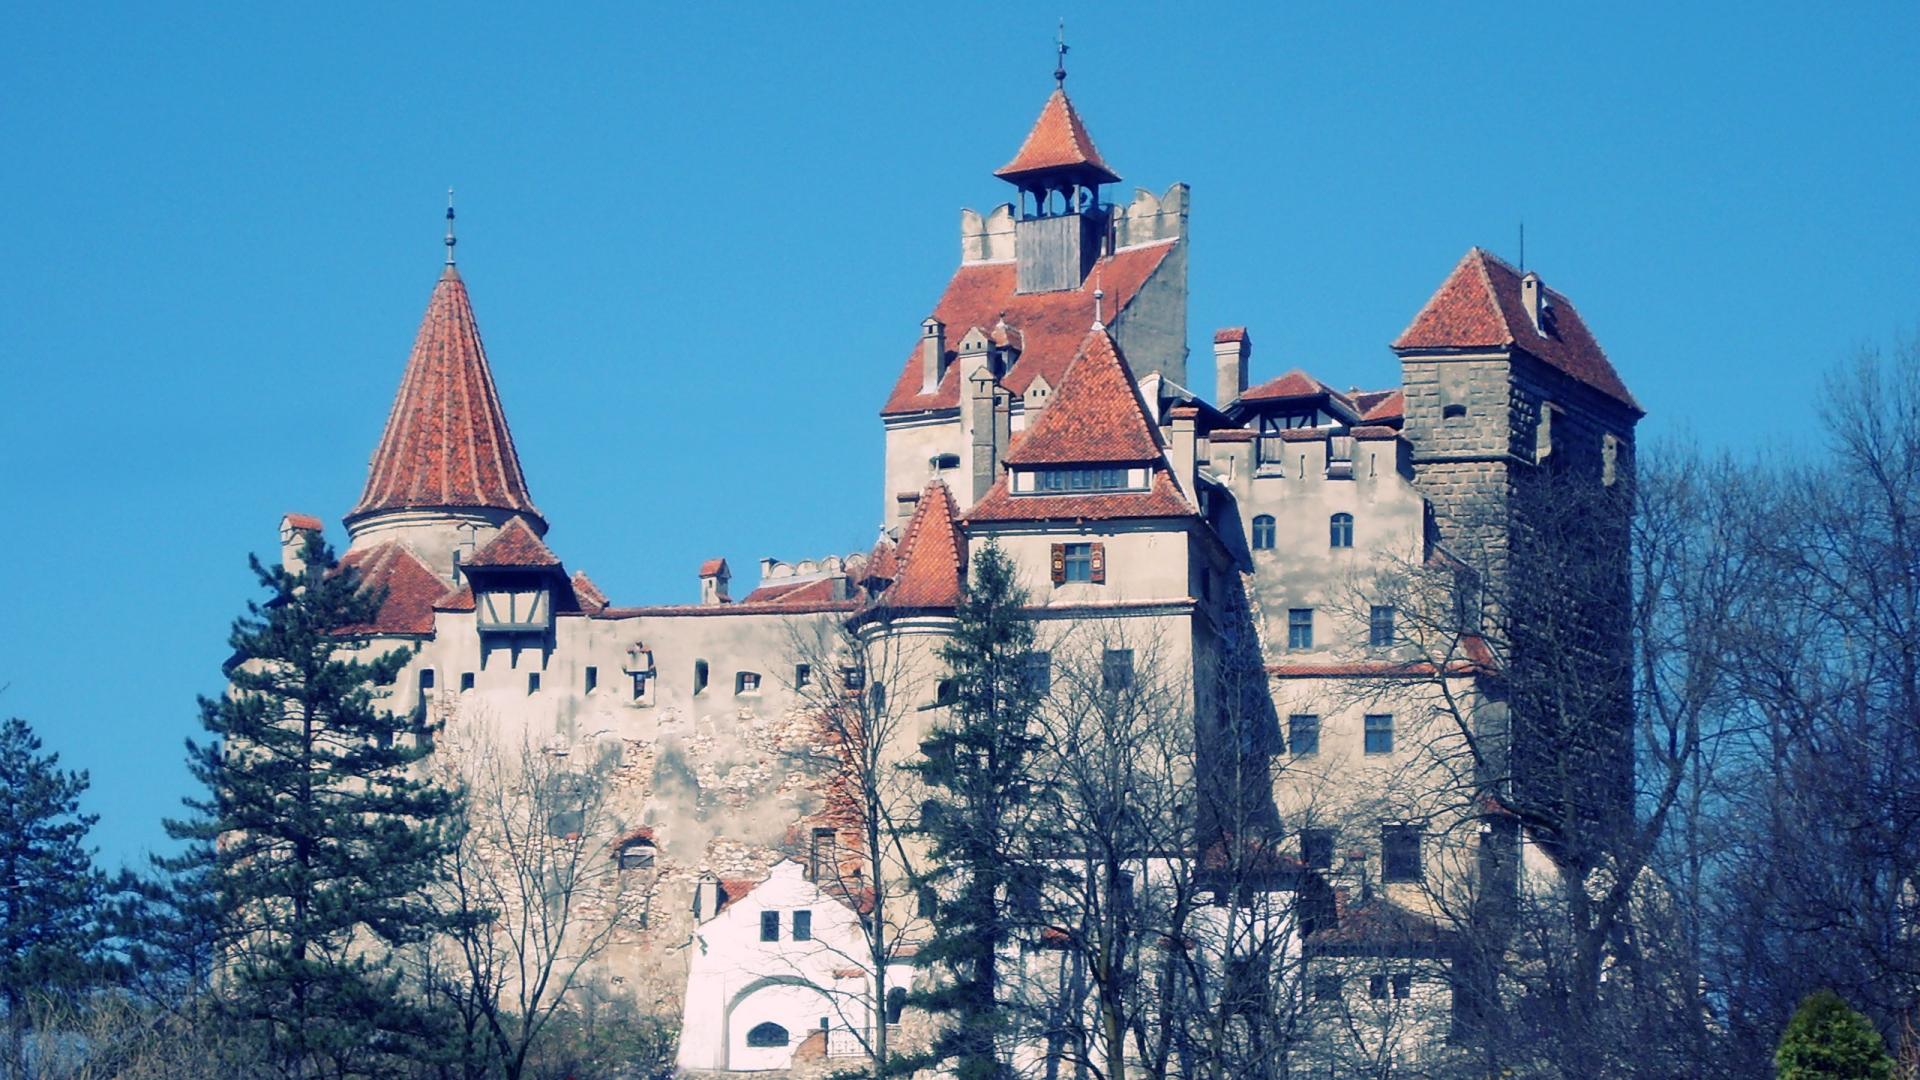 Draculas Castle wallpaper   698483 1920x1080